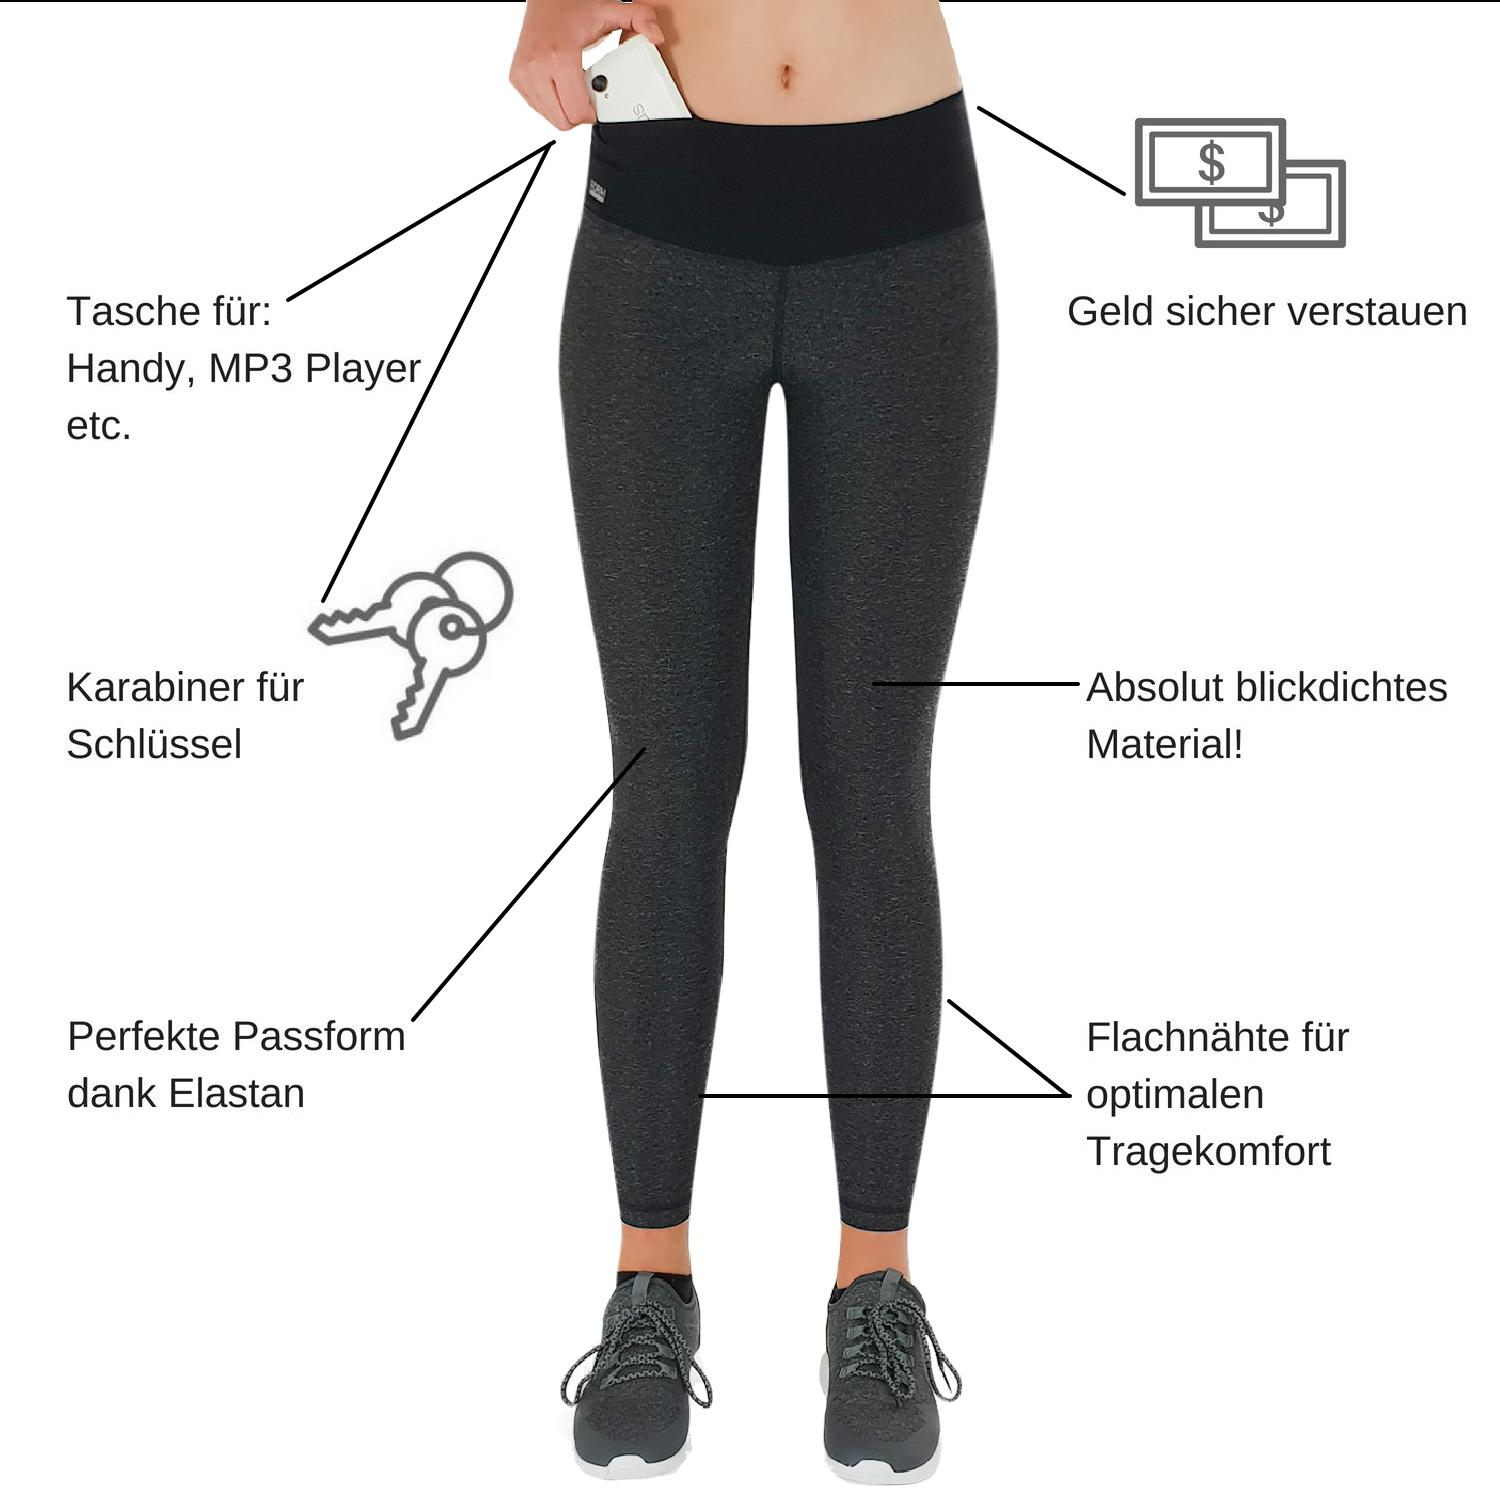 Damen-Laufhose-schwarz-grau-Infografik